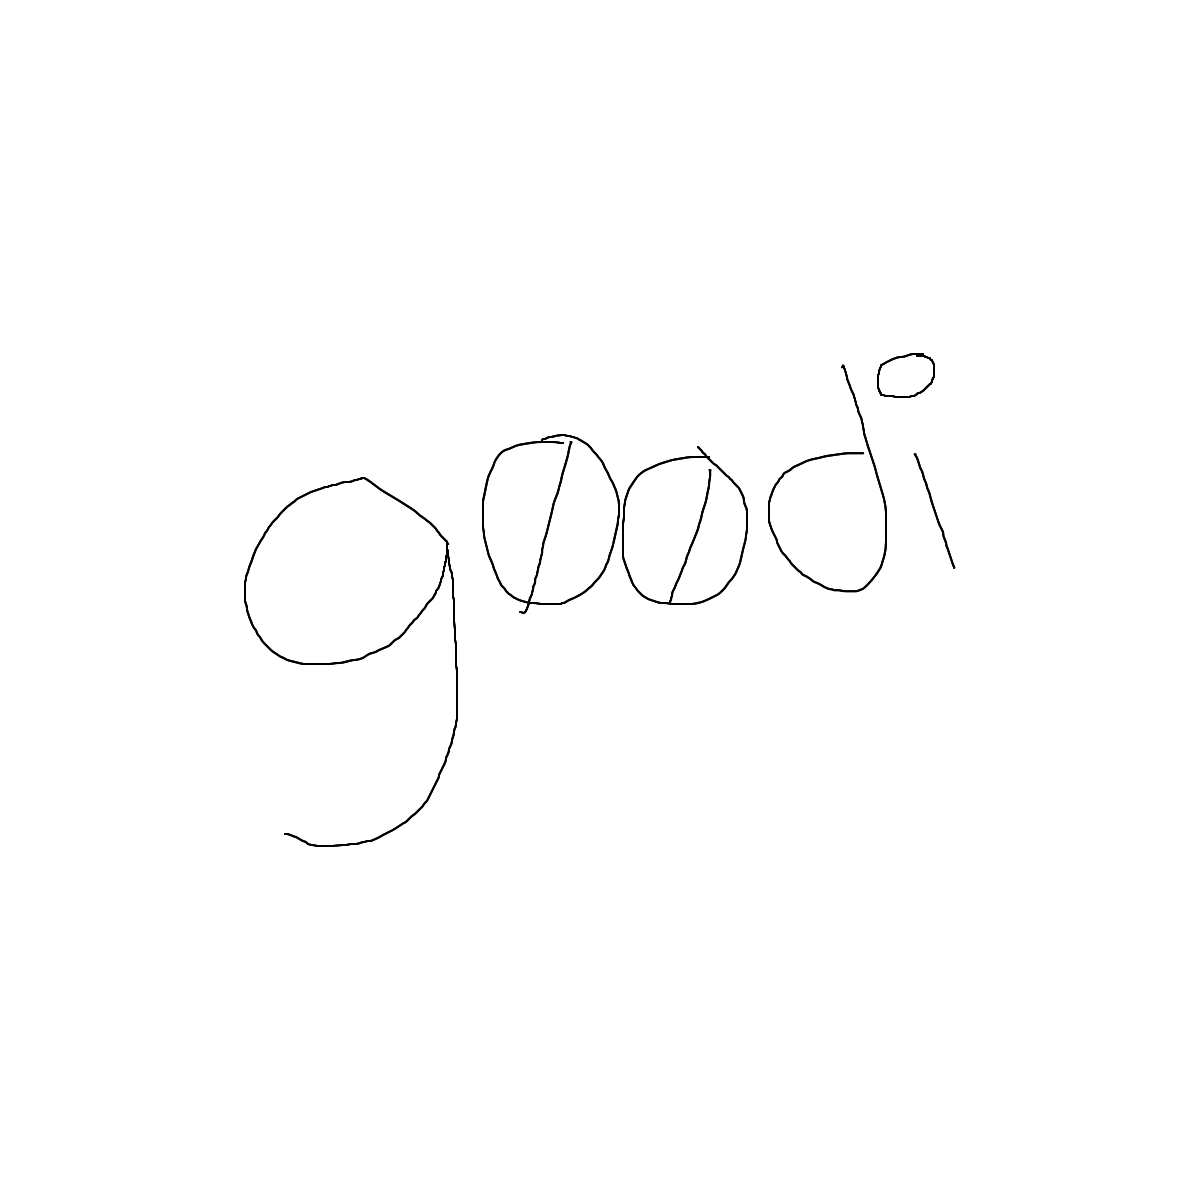 BAAAM drawing#1032 lat:51.8568534851074200lng: 19.4262847900390620